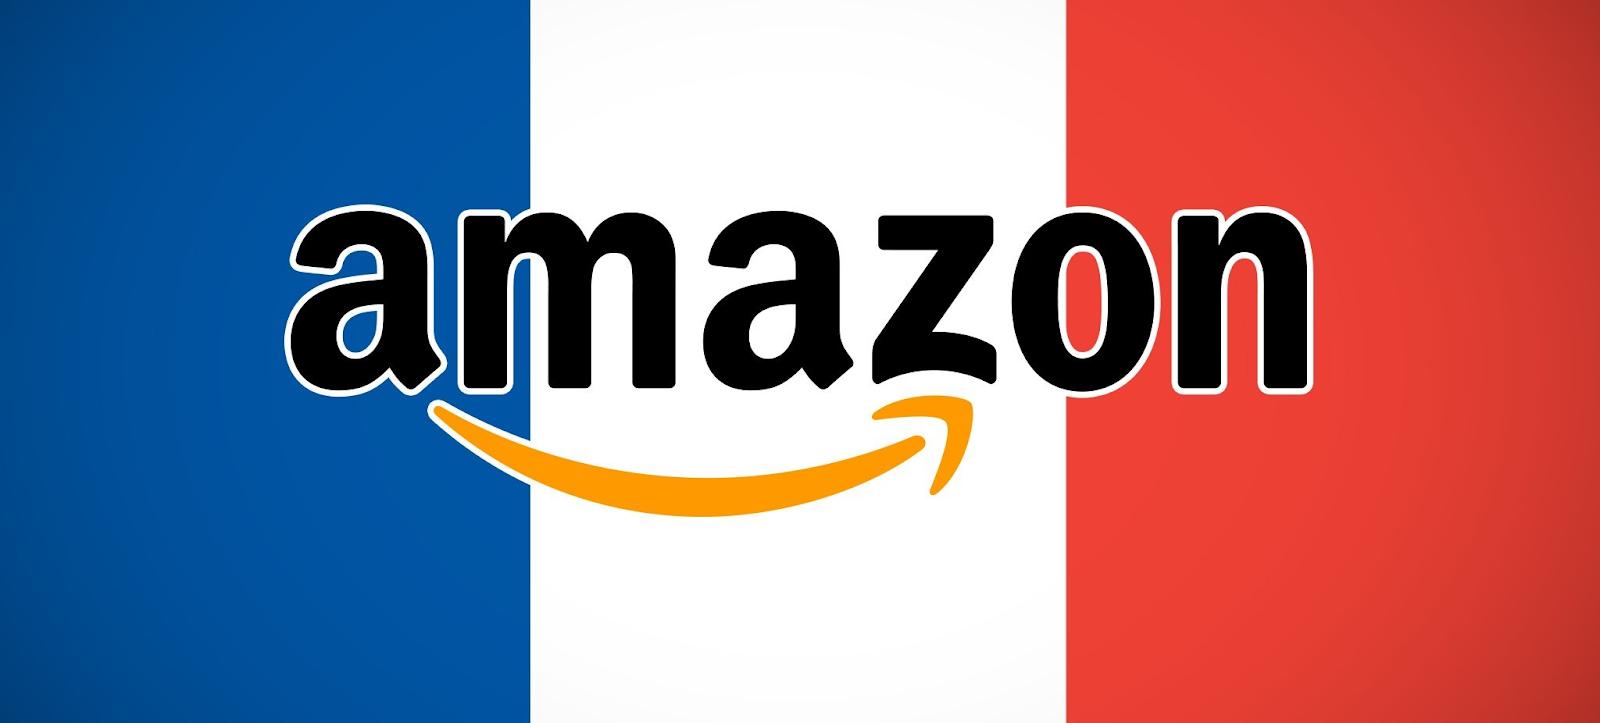 Achete sur Amazon